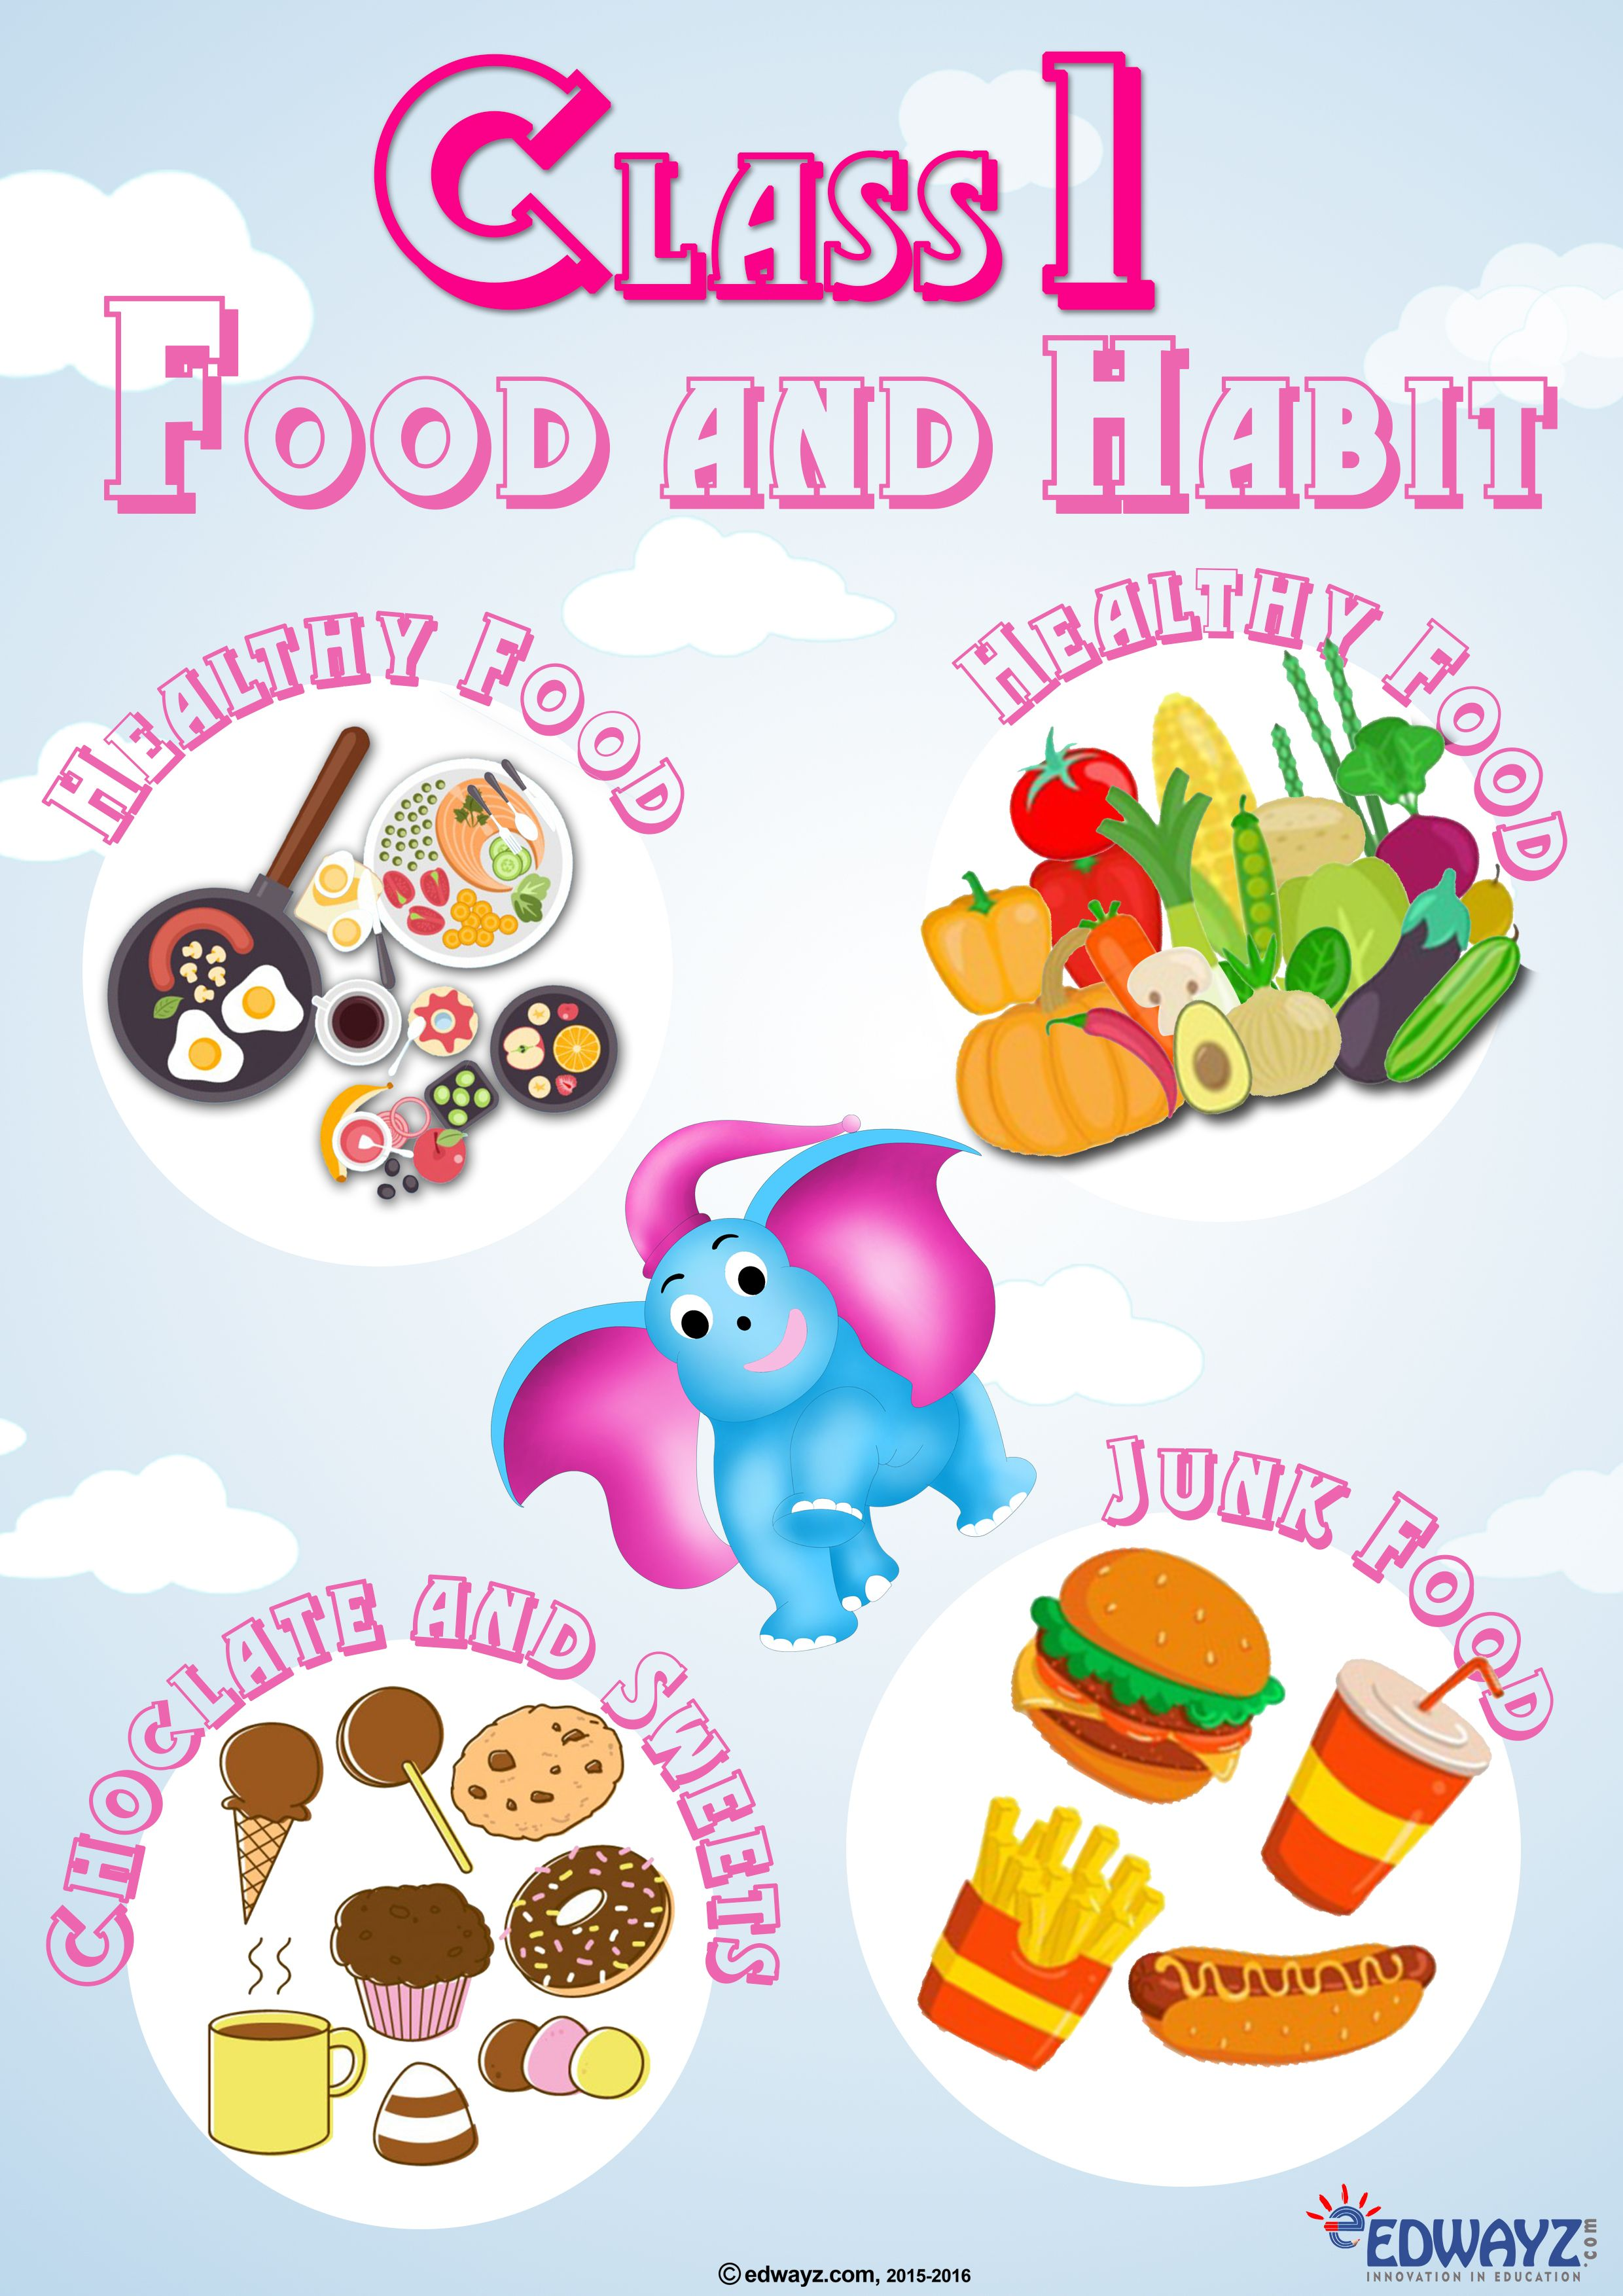 medium resolution of Worksheets_Class1_Food \u0026 habits   Worksheets for kids